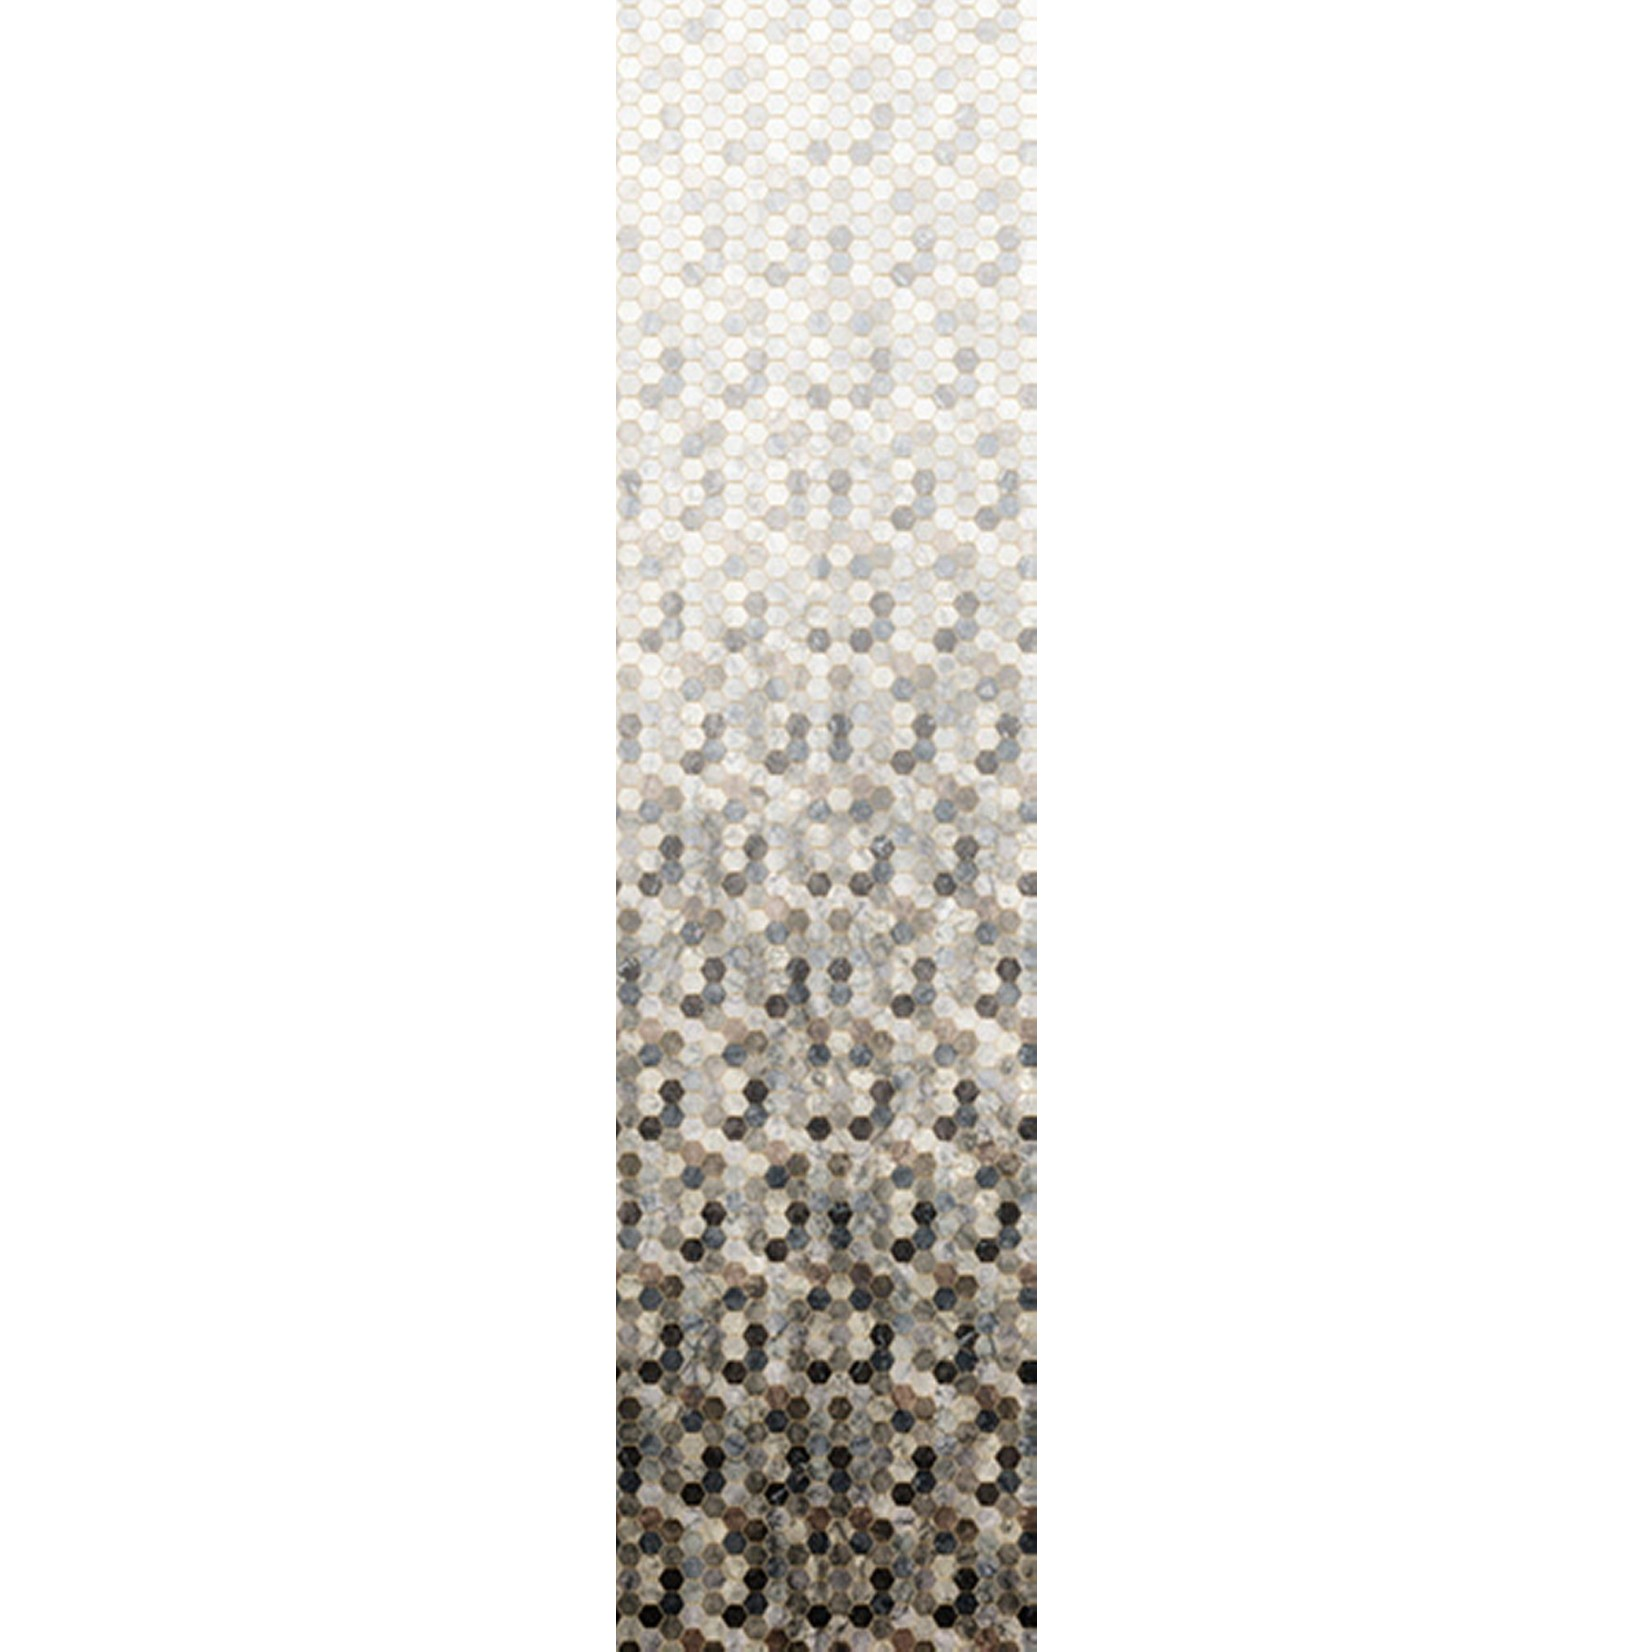 Hoffman Fabrics Backsplash 2.0 - Granite